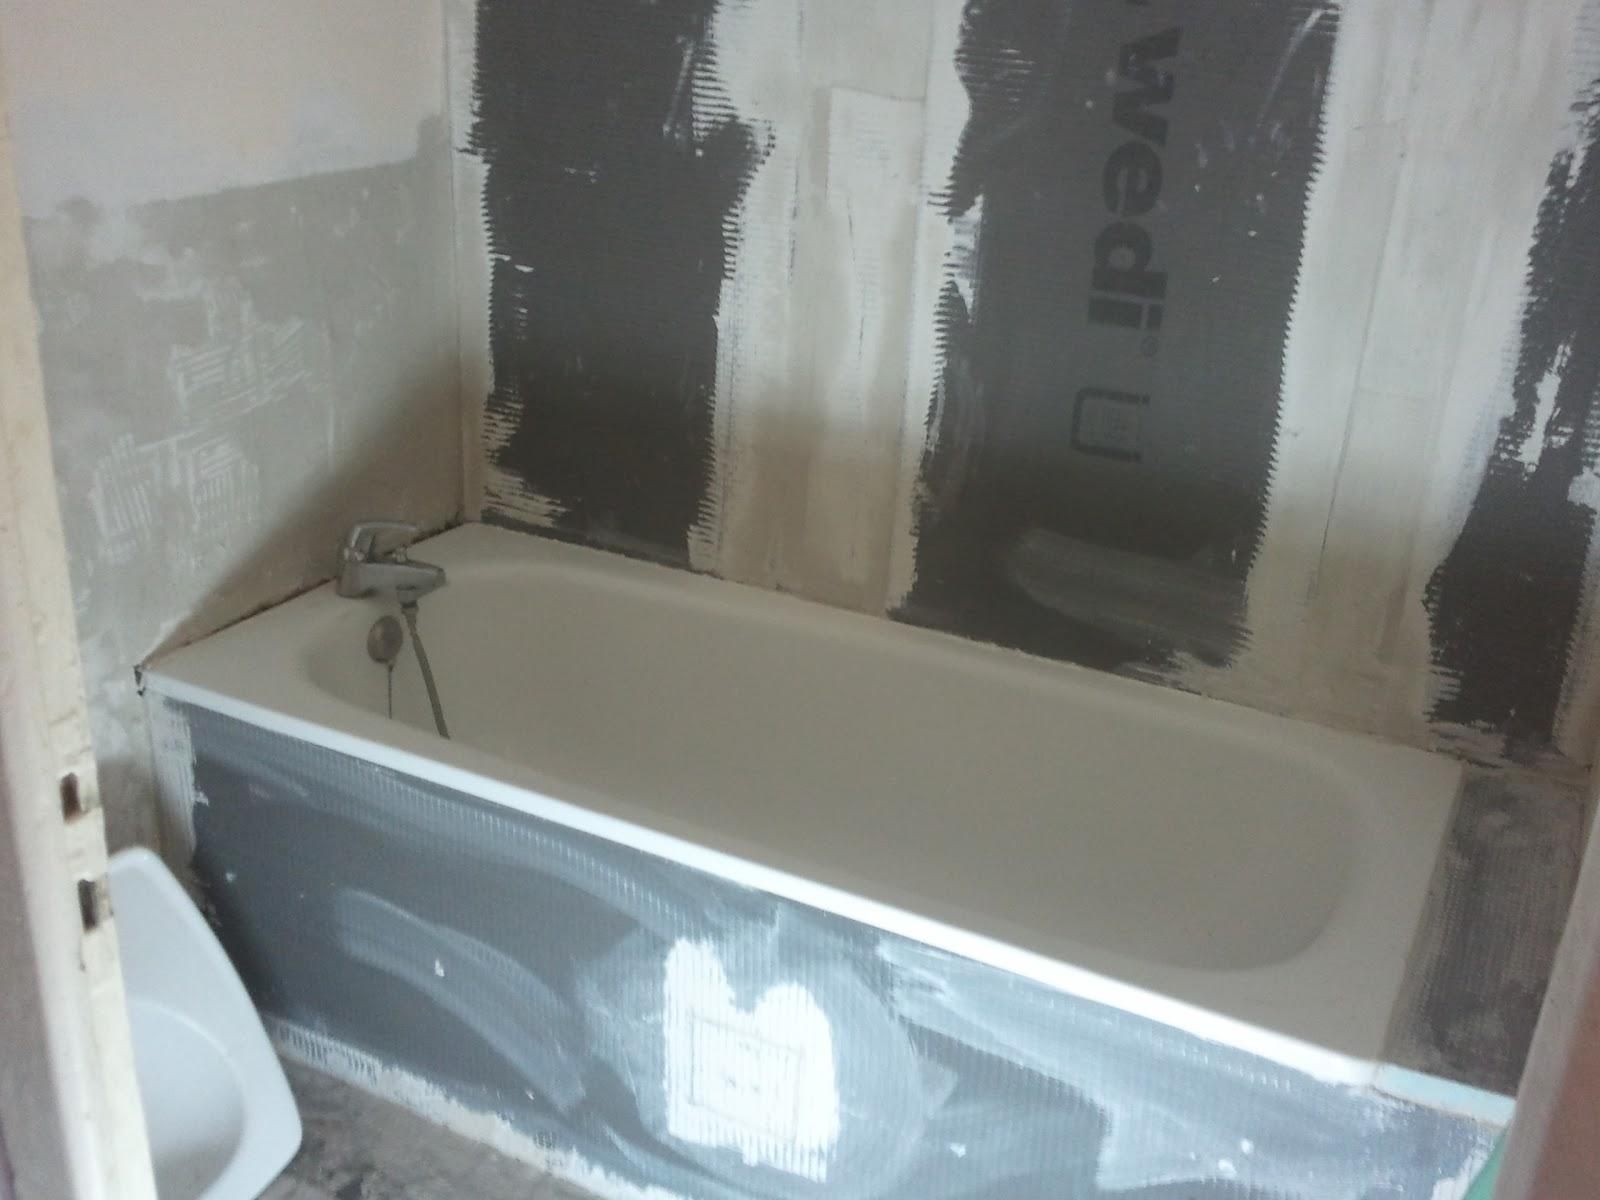 grenoble entreprise de carrelage concept design et r alisation r novation salle de bain. Black Bedroom Furniture Sets. Home Design Ideas